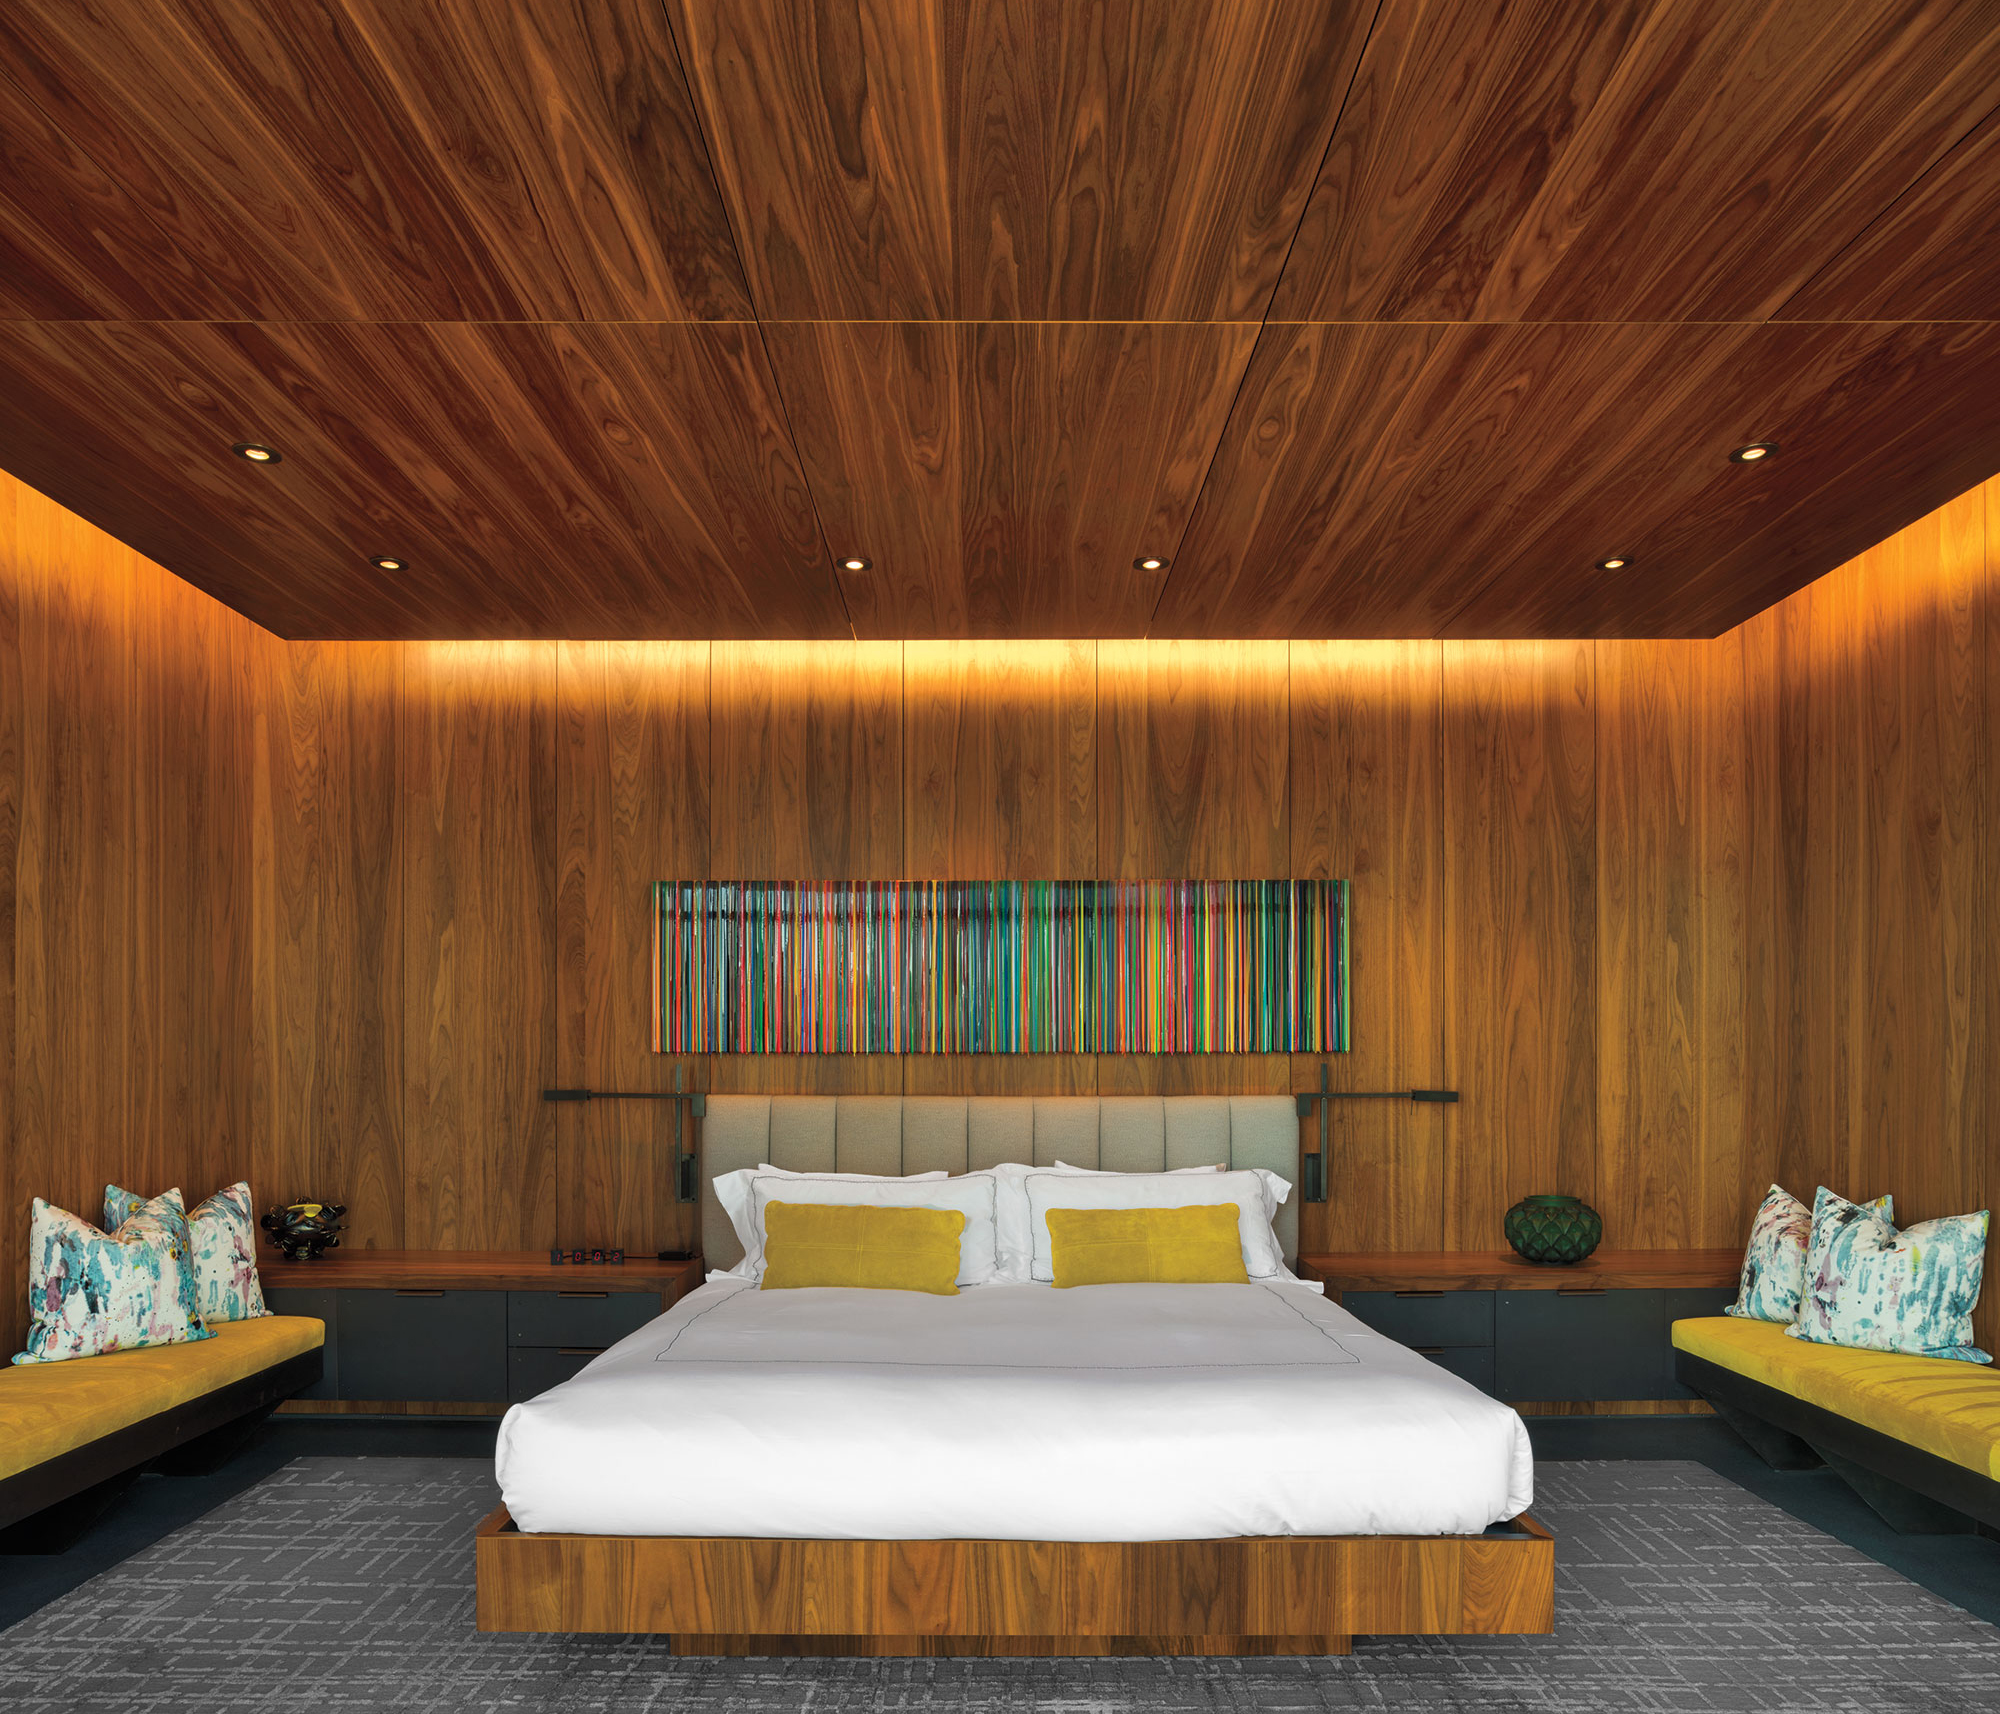 15 Dreamy Bedrooms